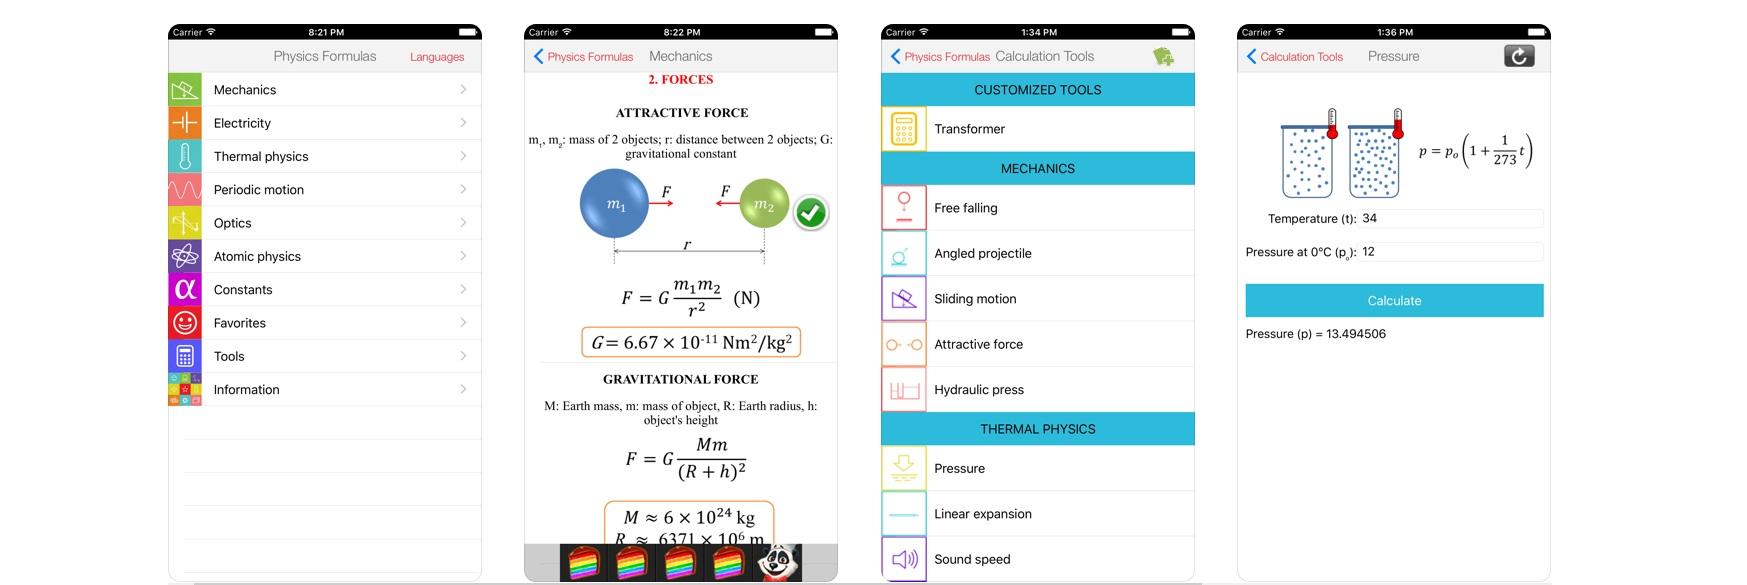 Fórmulas Física Free